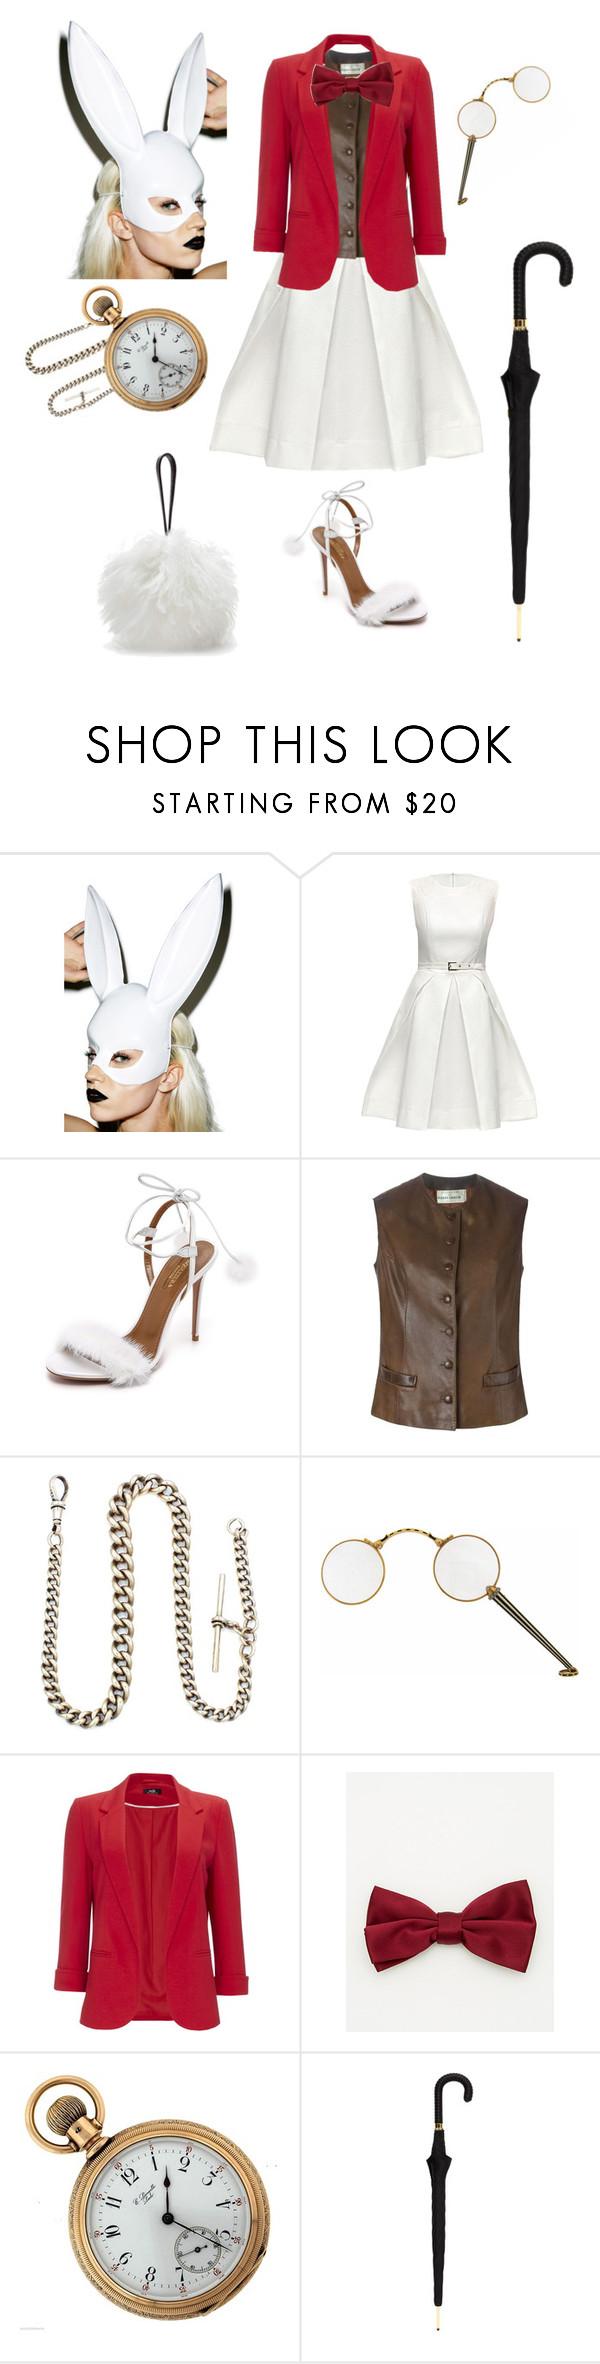 """White Rabbit Halloween"" by kjmazeltov ❤ liked on Polyvore featuring Leg Avenue, Lattori, Aquazzura, Pierre Cardin, Wallis, Le Chateau, Alexander McQueen and Tanya Taylor"